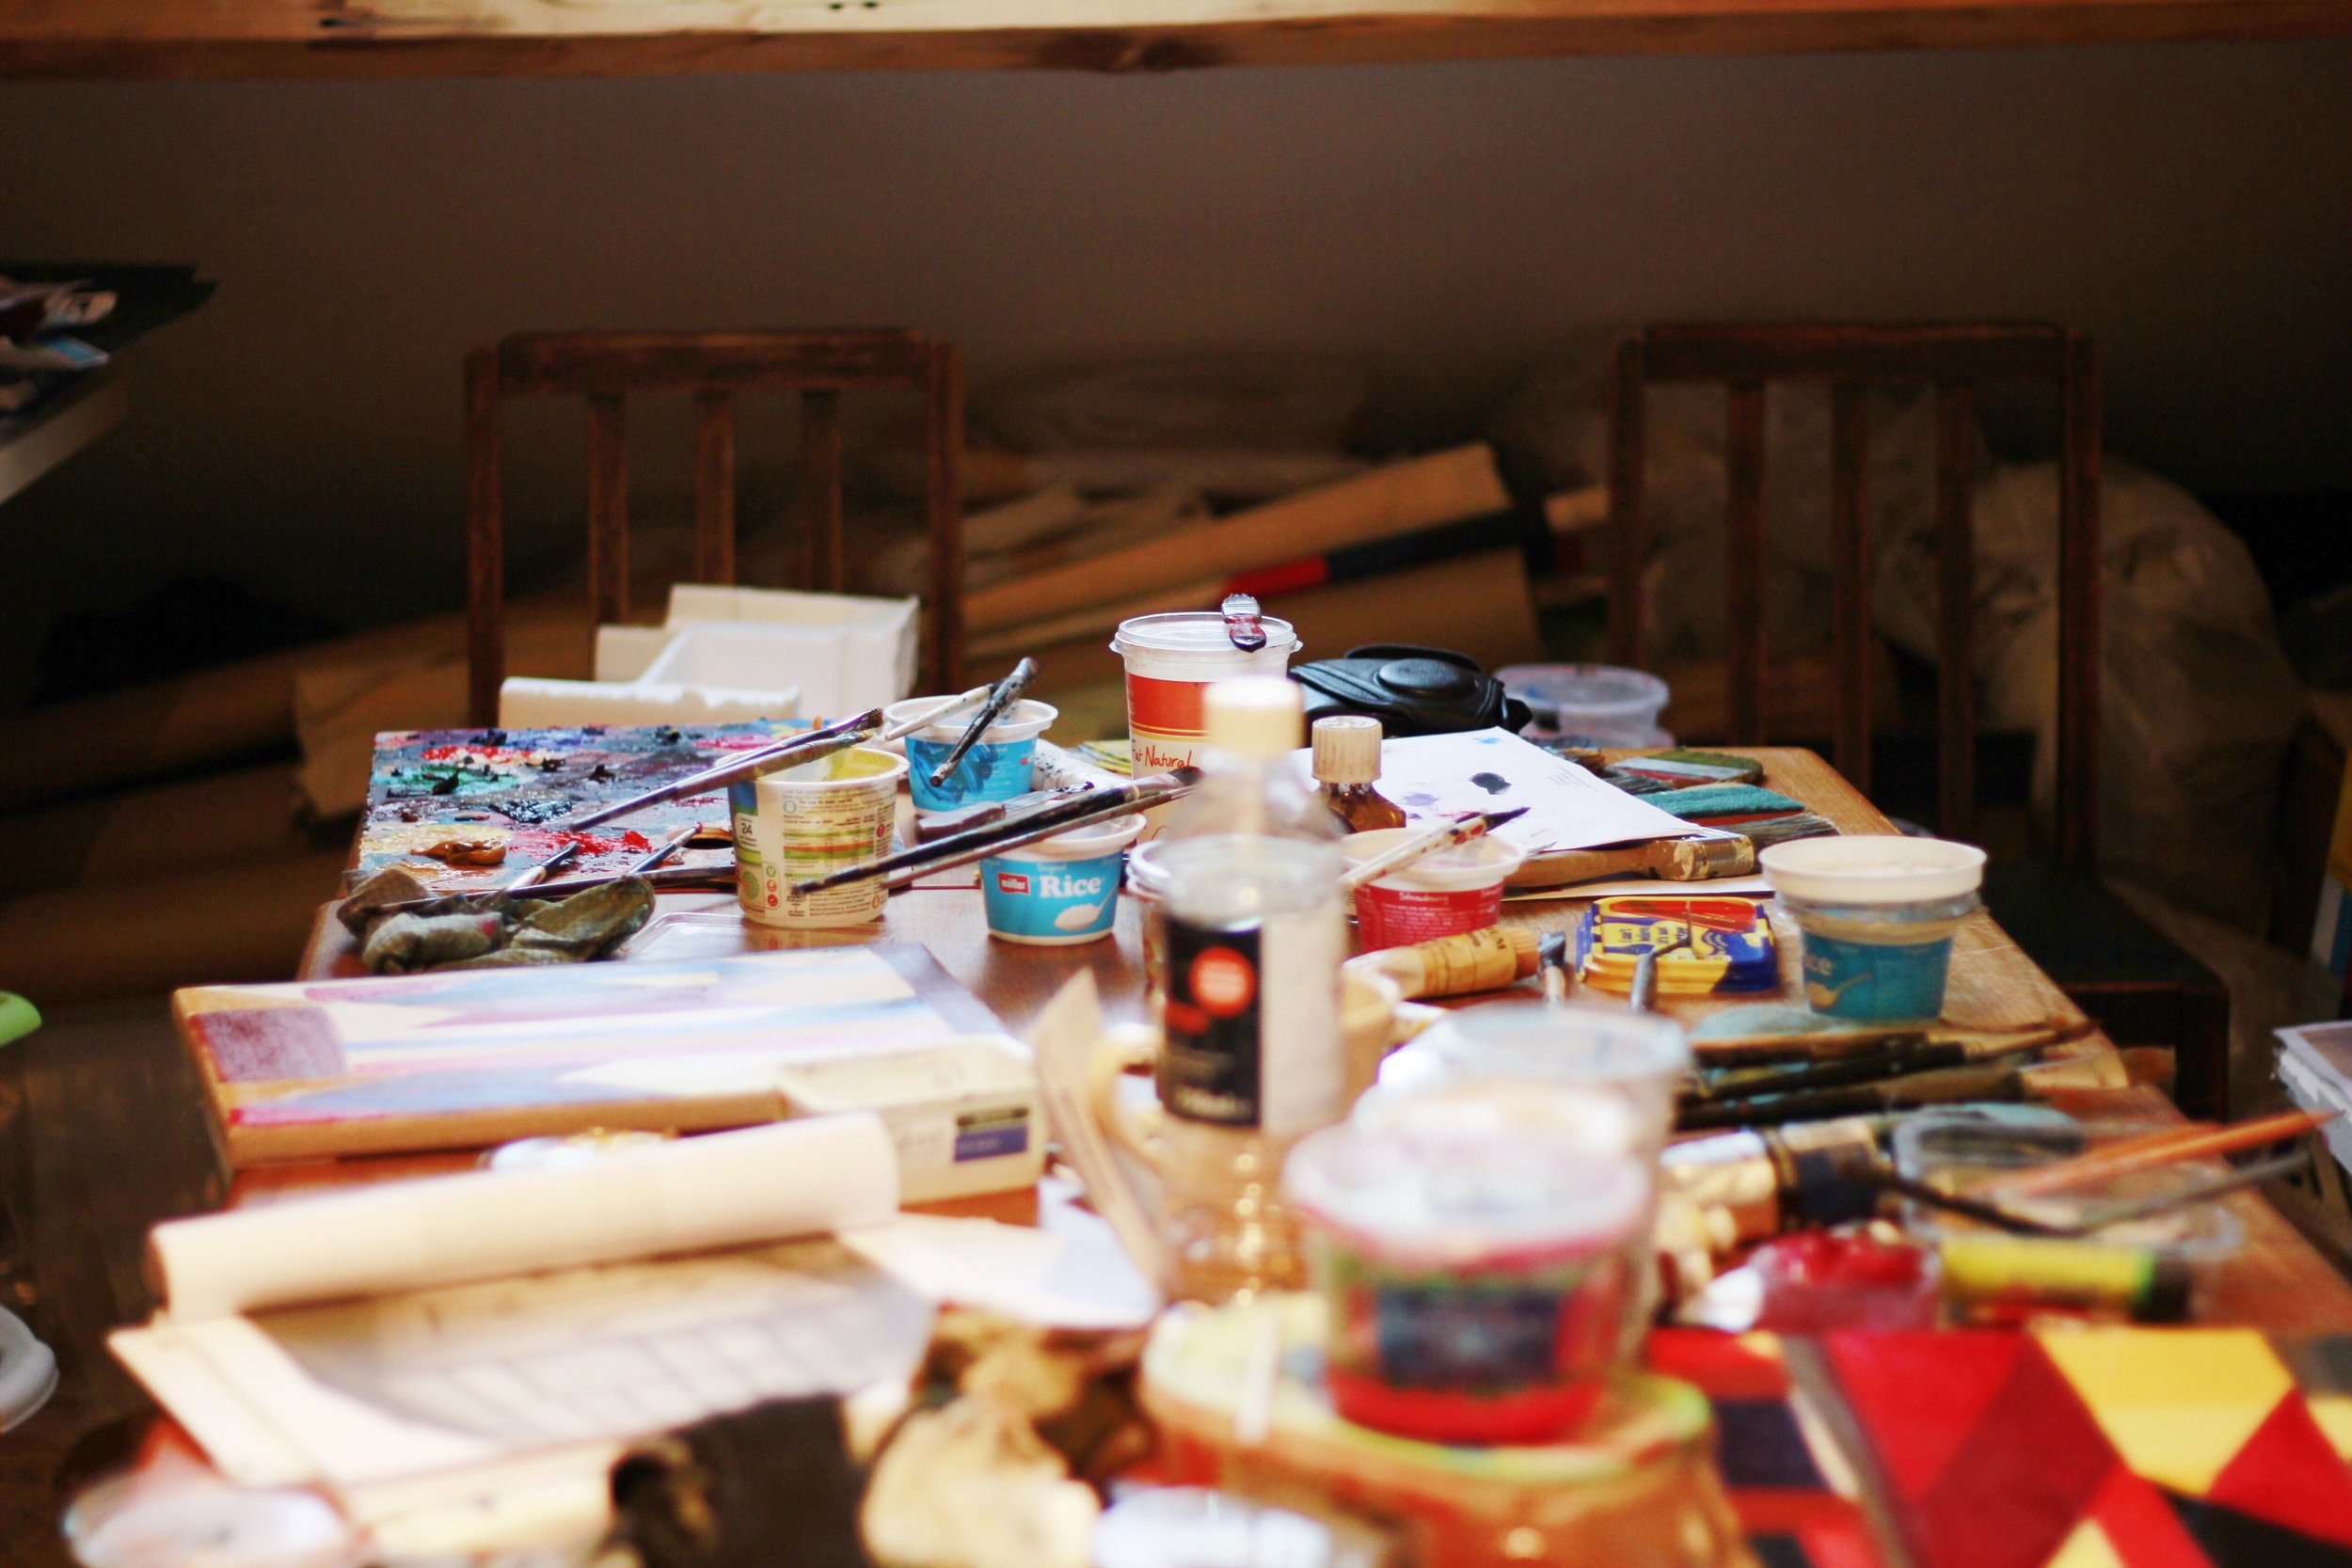 In Atta Kwami's studio, Copyright Sharon Obuobi